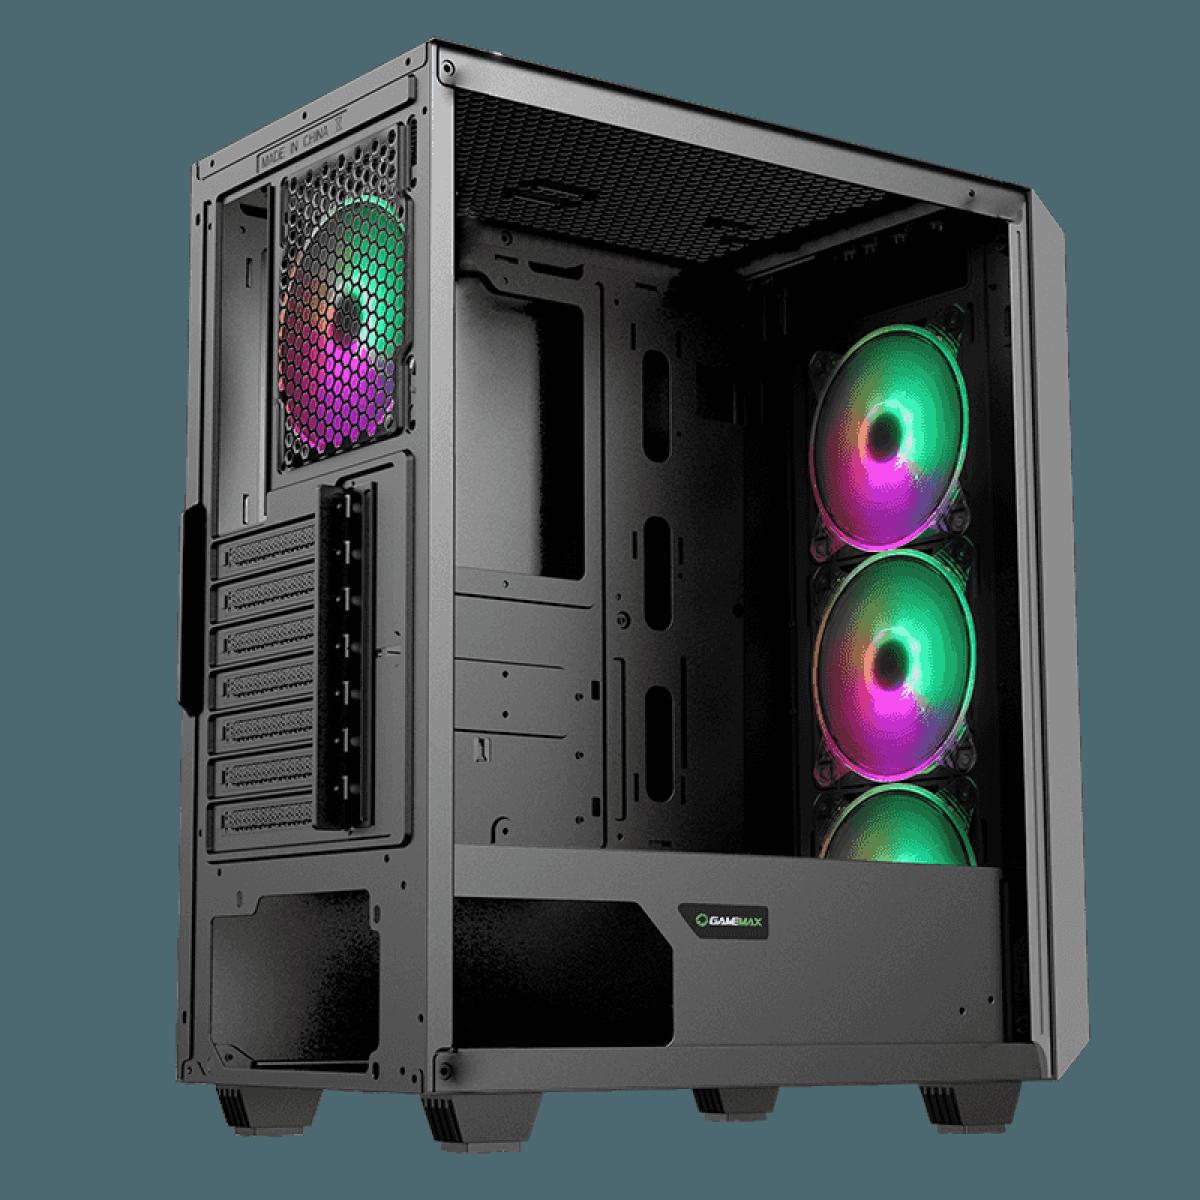 Gabinete Gamer Gamemax Revolt 3606, RGB,  Mid Tower, Vidro Temperado, Preto, S-Fonte, Com 3 Fans, GAMEMAX REVOLT - BLACK